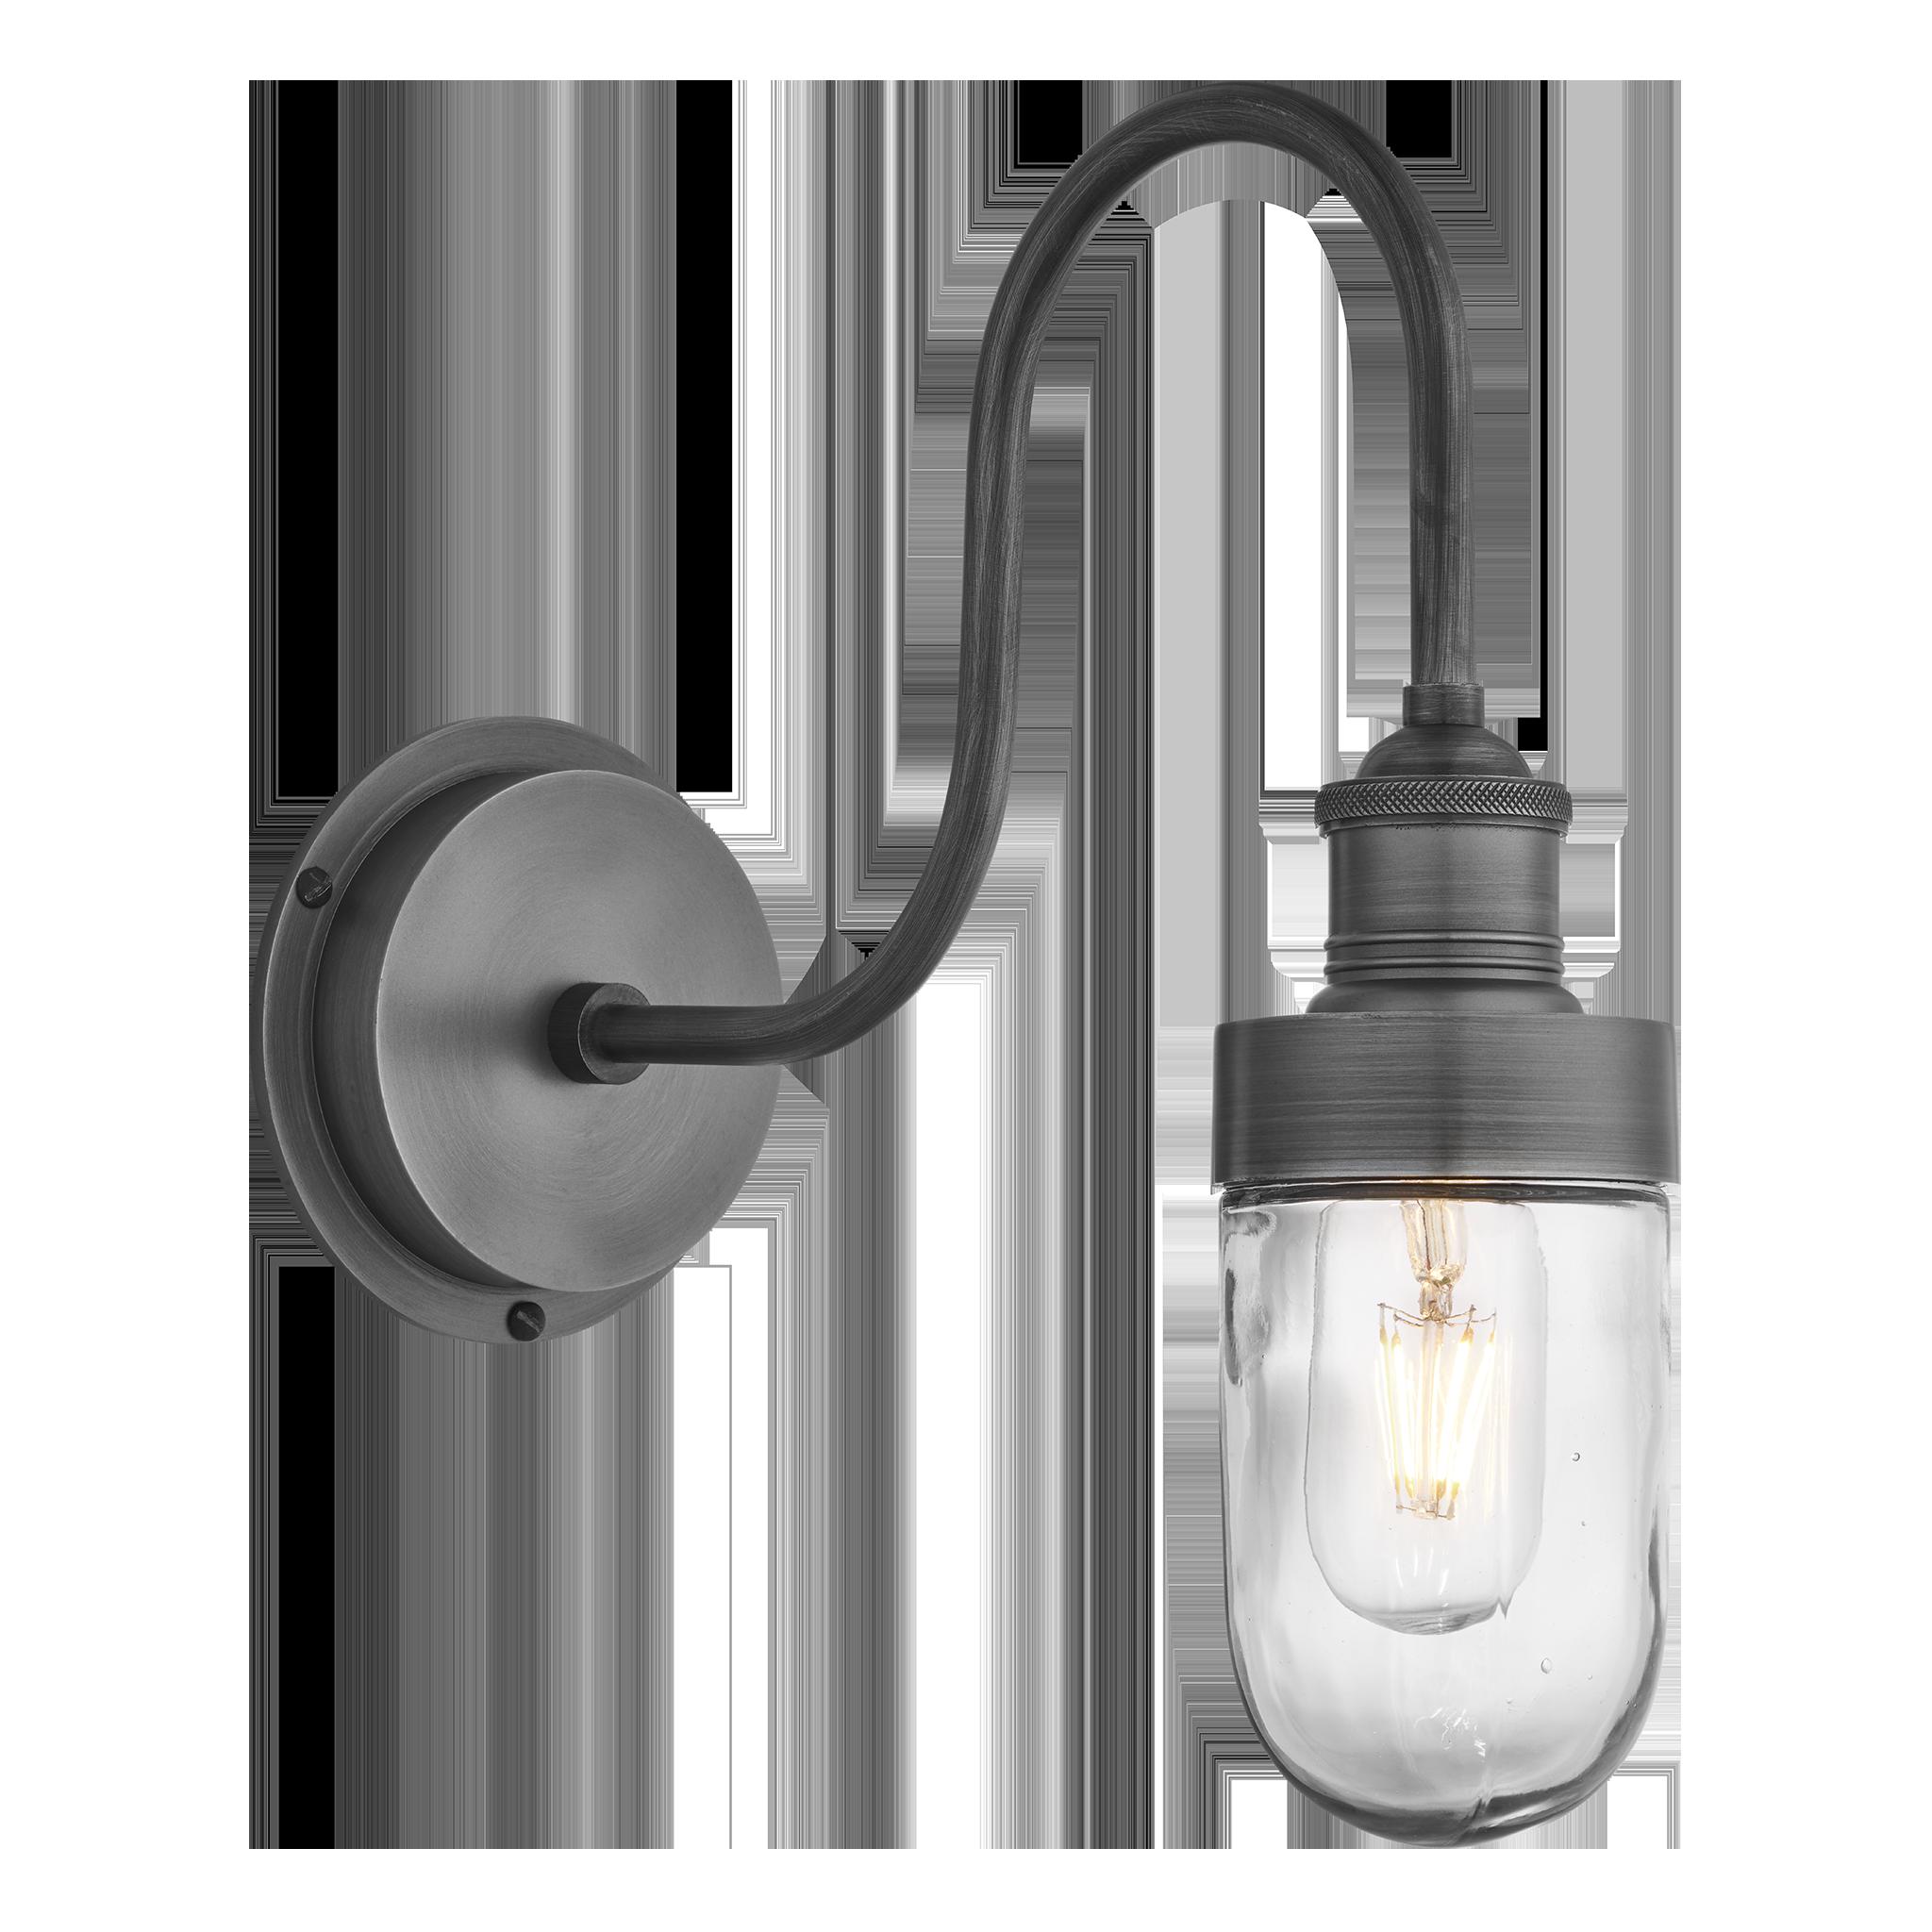 Wall Light Outdoor Lantern Glass Diffuser Black wall down lantern glow swan neck